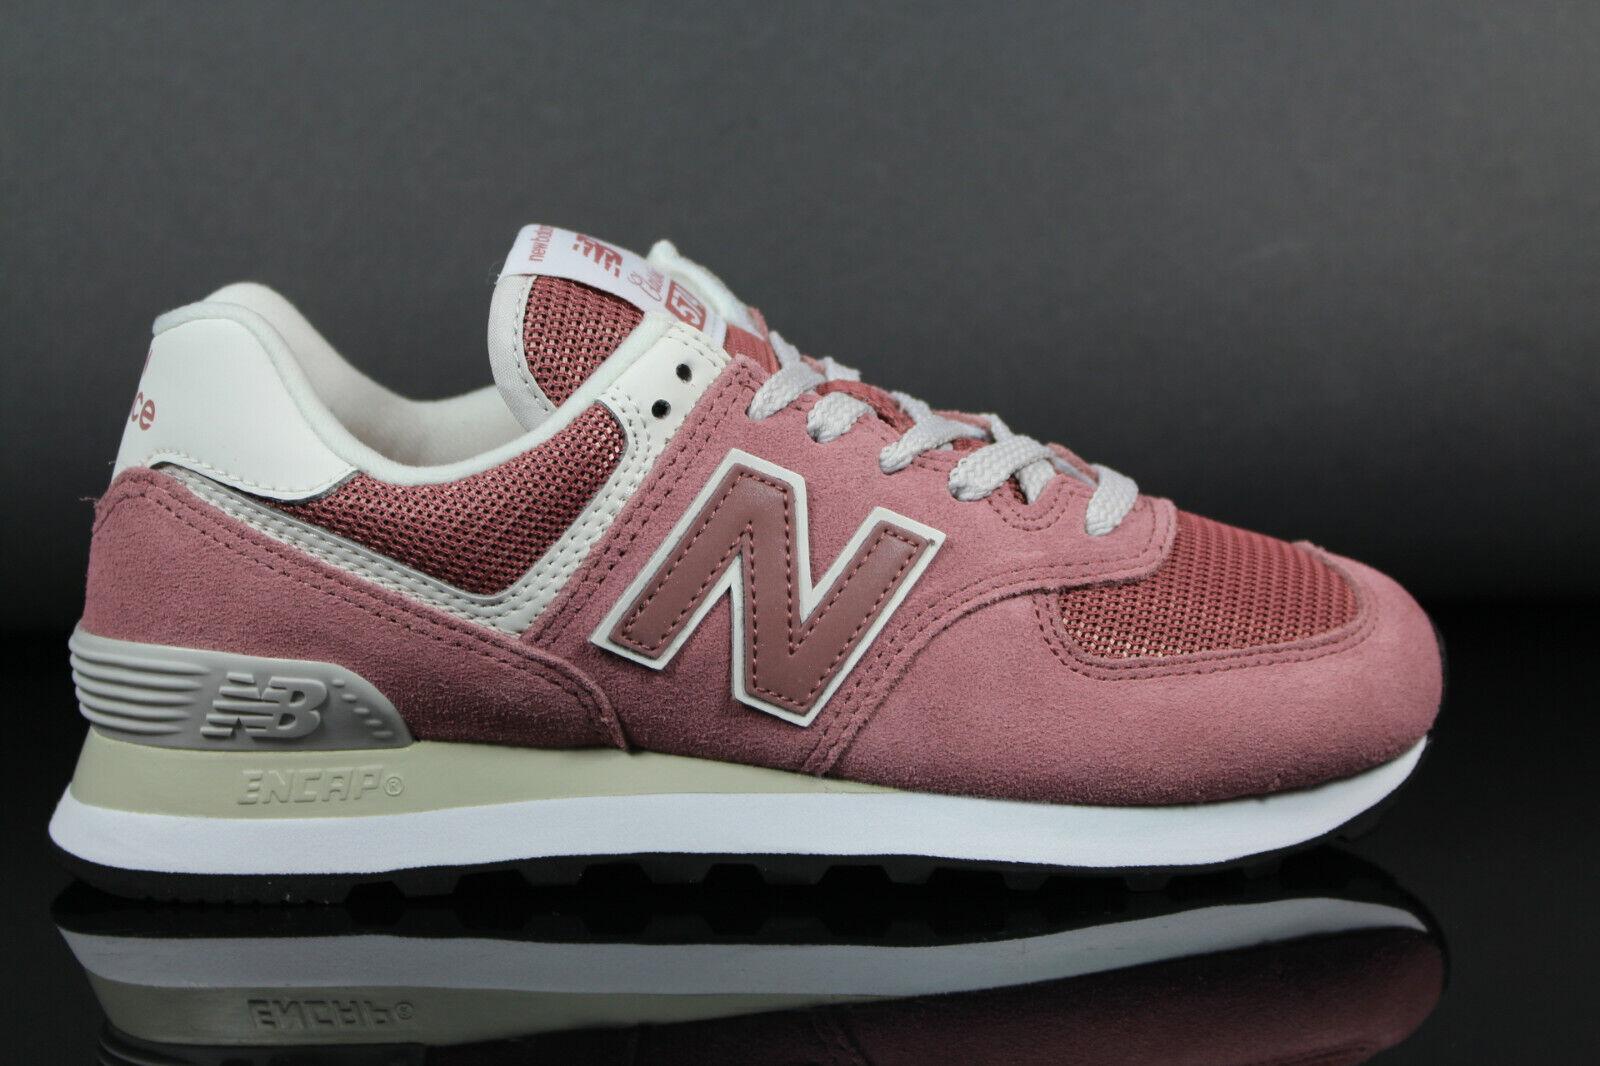 Neu New Balance WL574CRC Damen Senaker Sportschuhe Schuhe Turnschuhe Freizeit